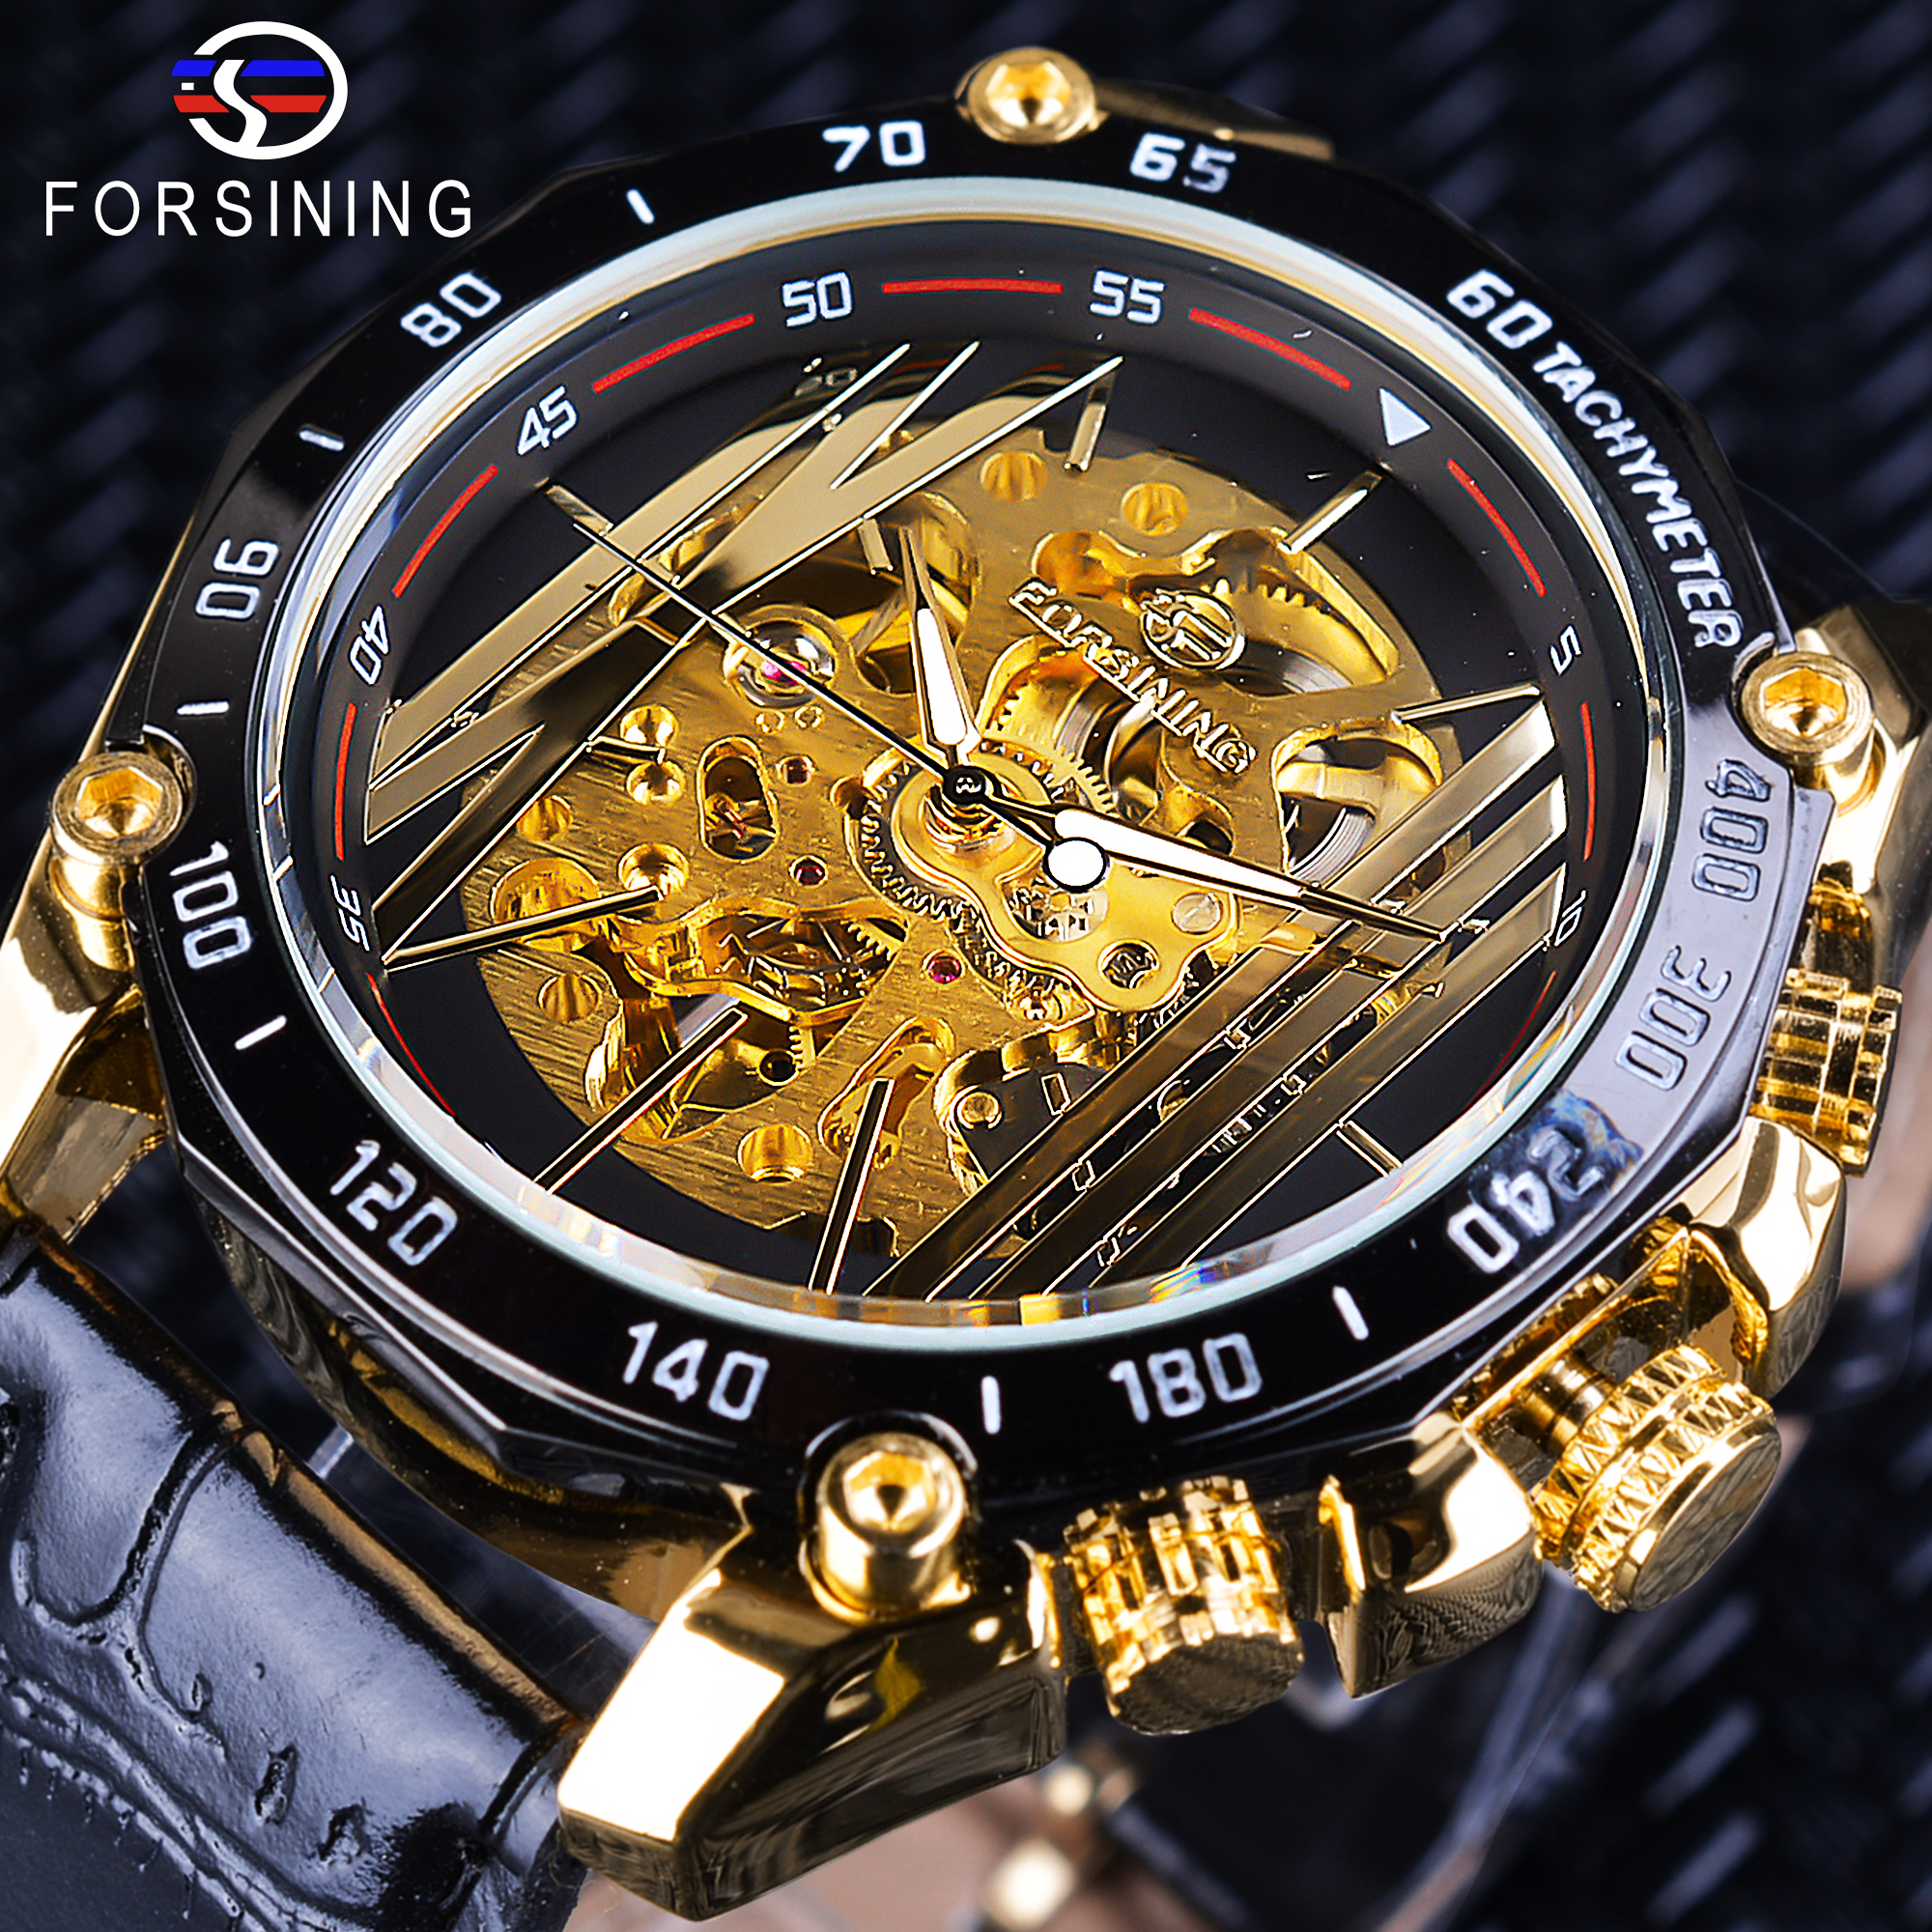 Forsining Big Dial Steampunk Design Luxury Golden Gear Movement Men Creative Openwork Watches Automatic Mechanical Wrist Watches